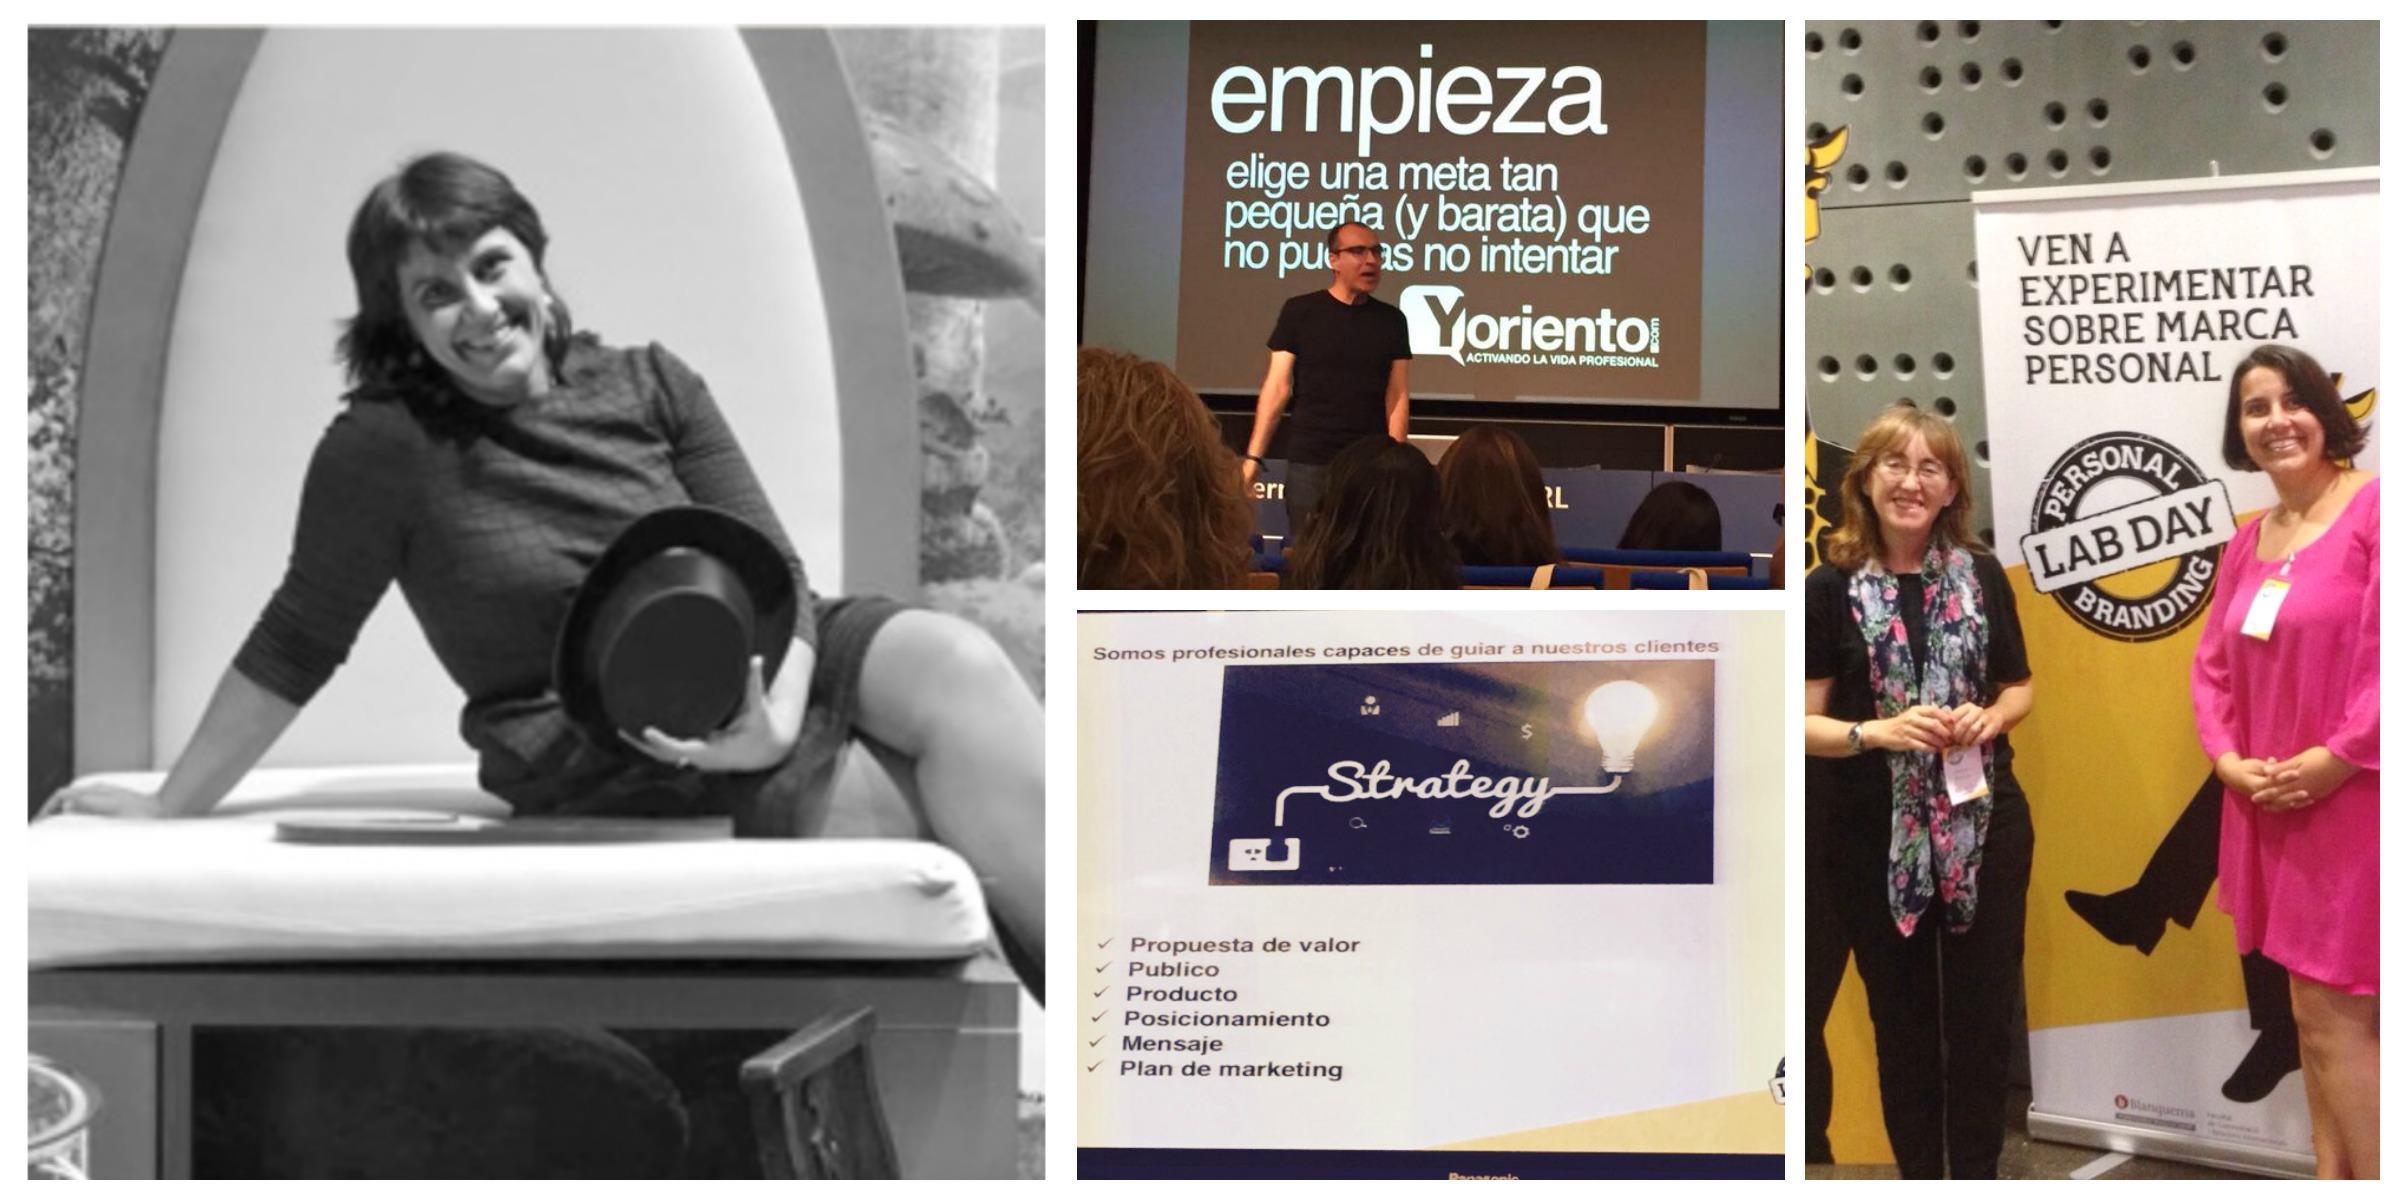 Joana Aranda en el Personal Branding Lab Day